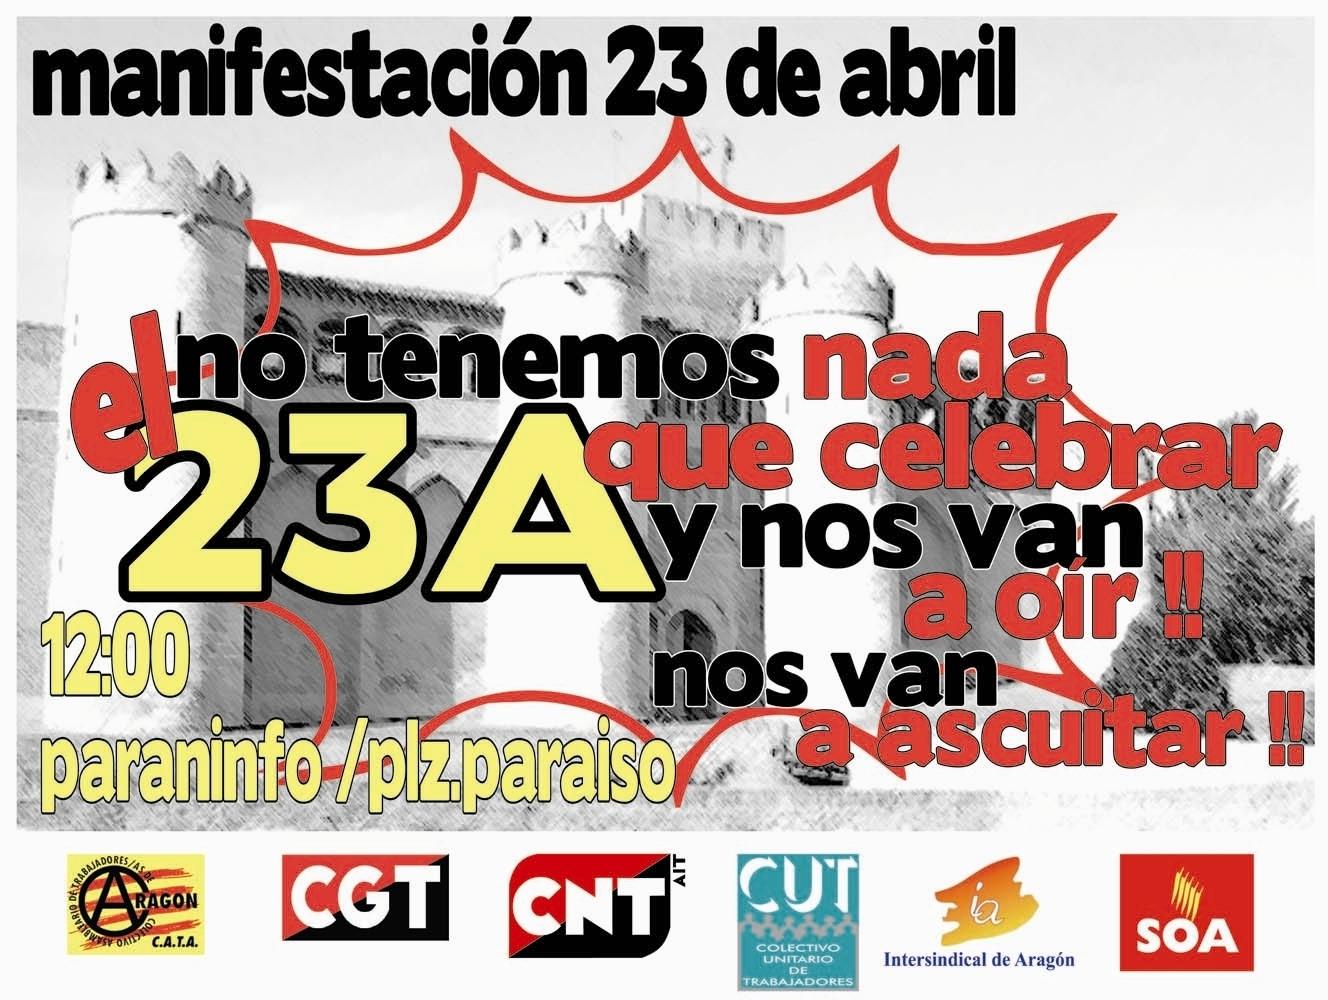 Manifestación 23 de Abril: nada que celebrar